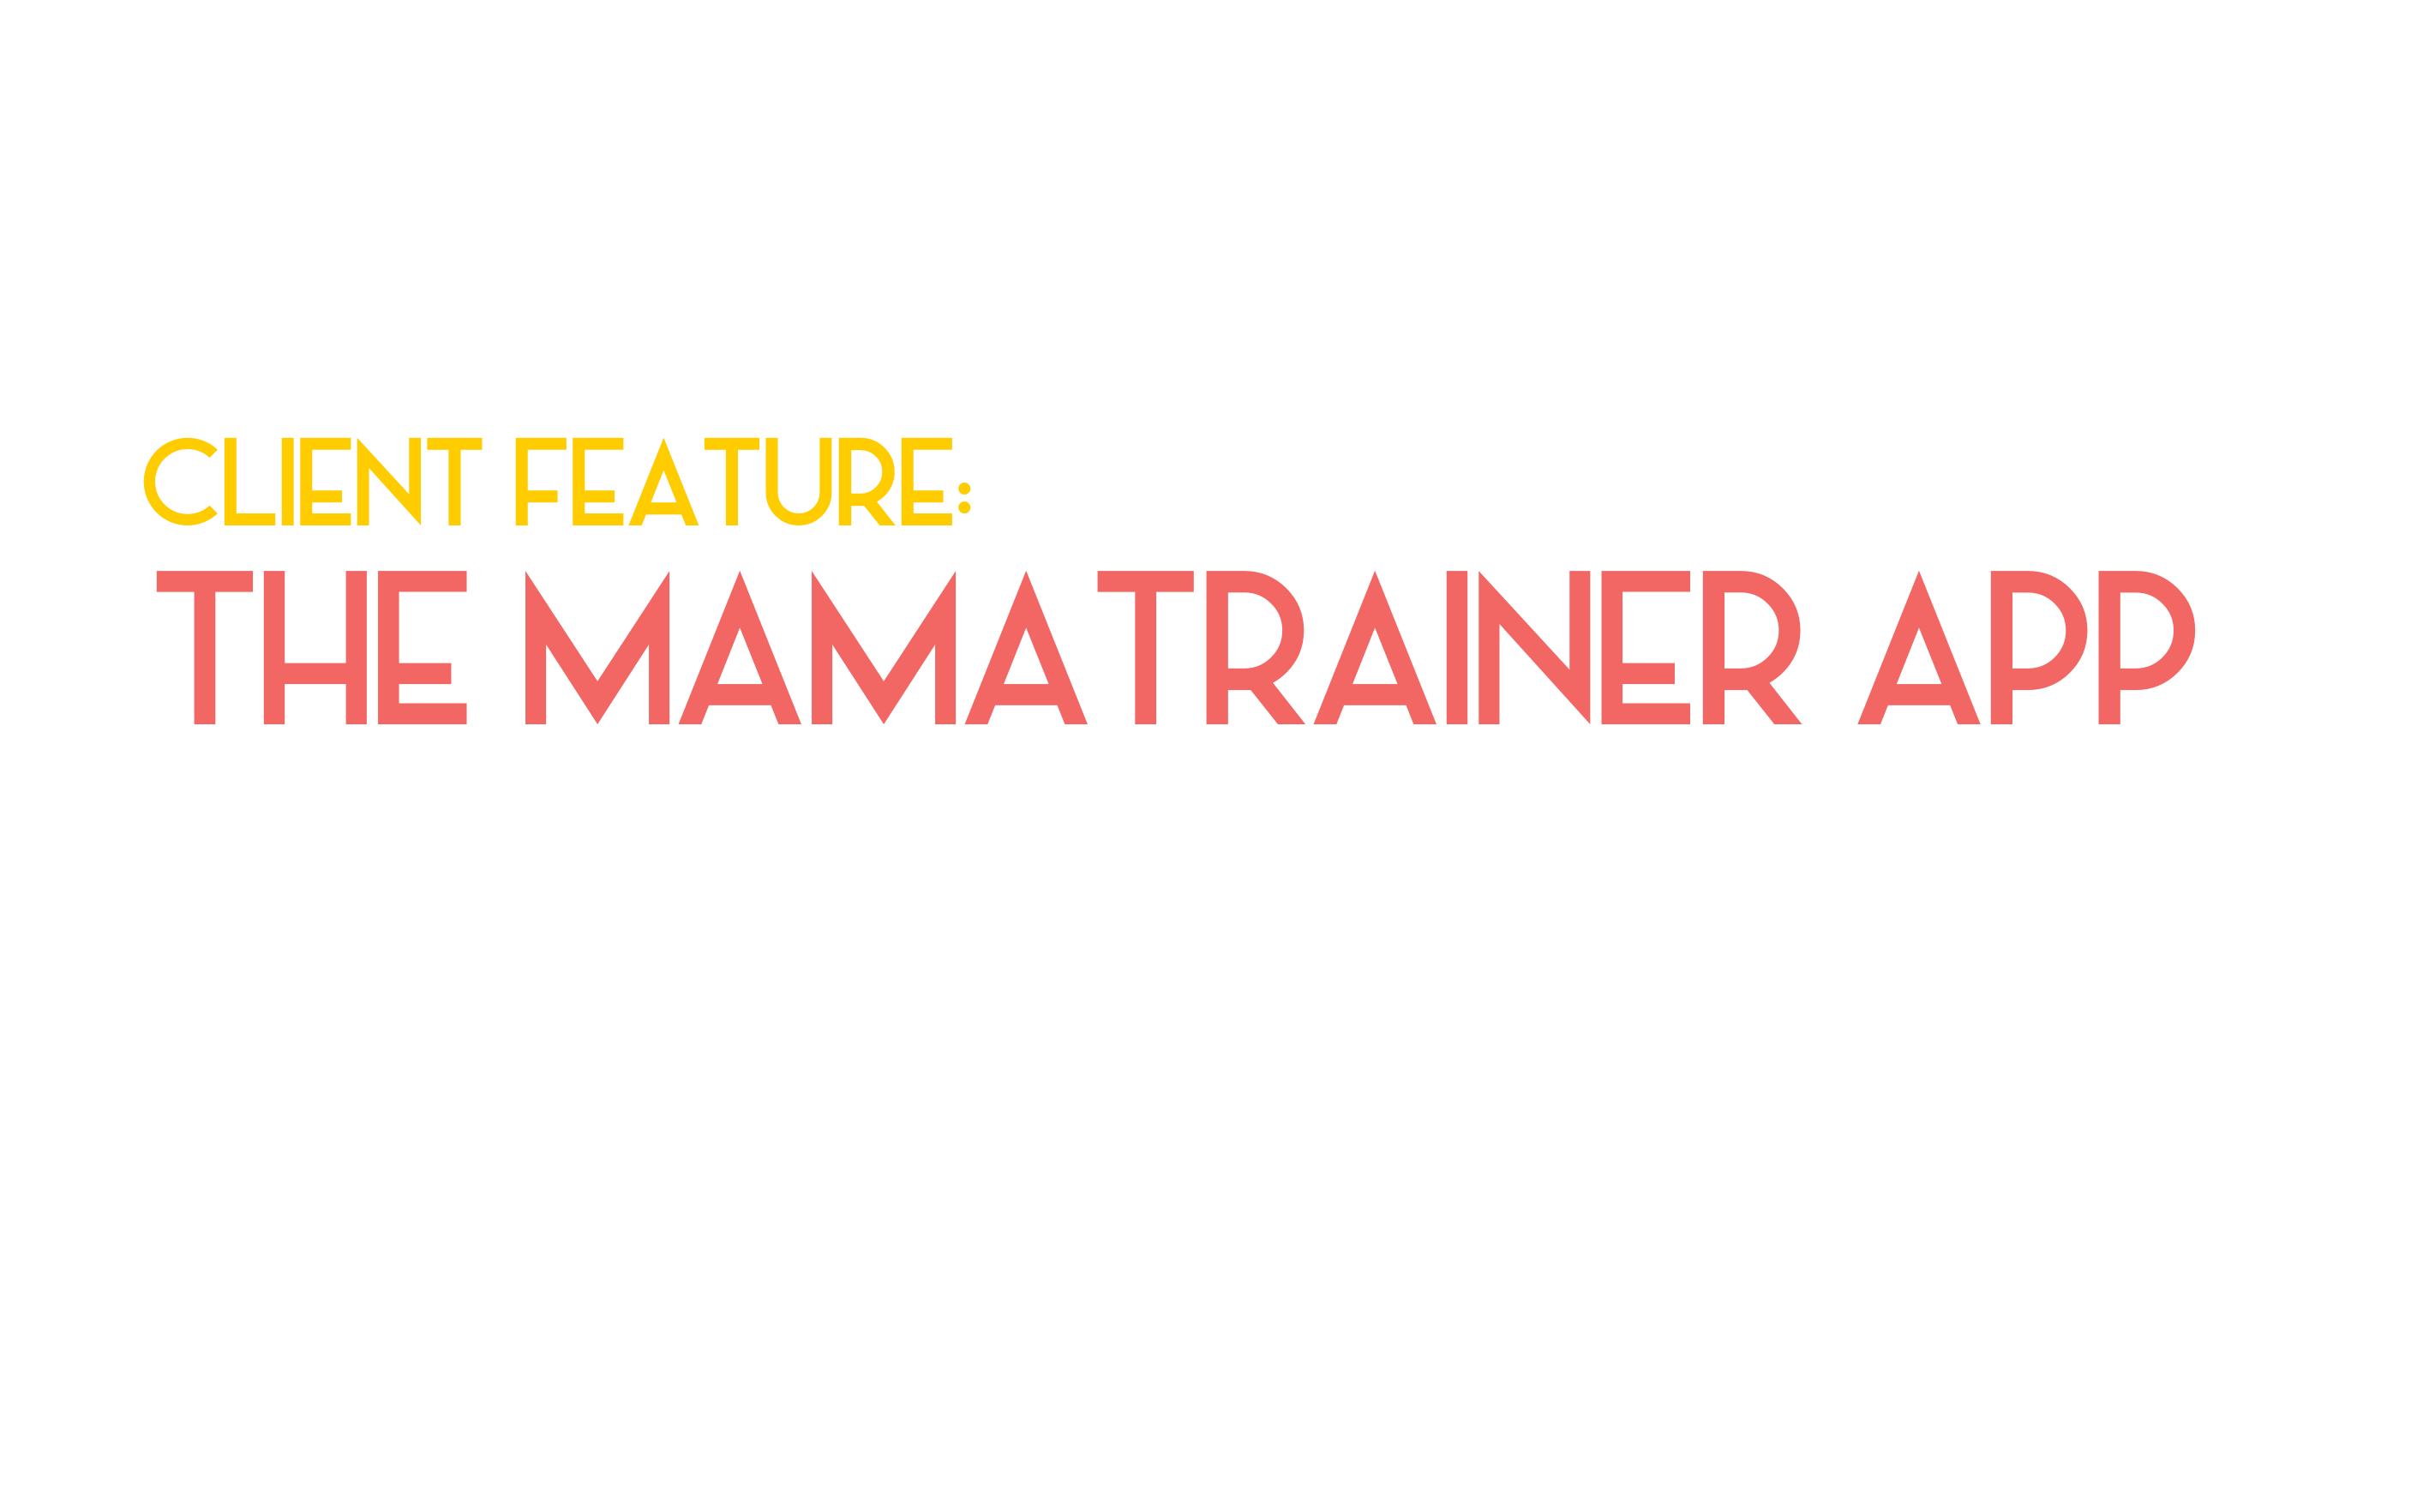 Client Feature: The Mamatrainer App